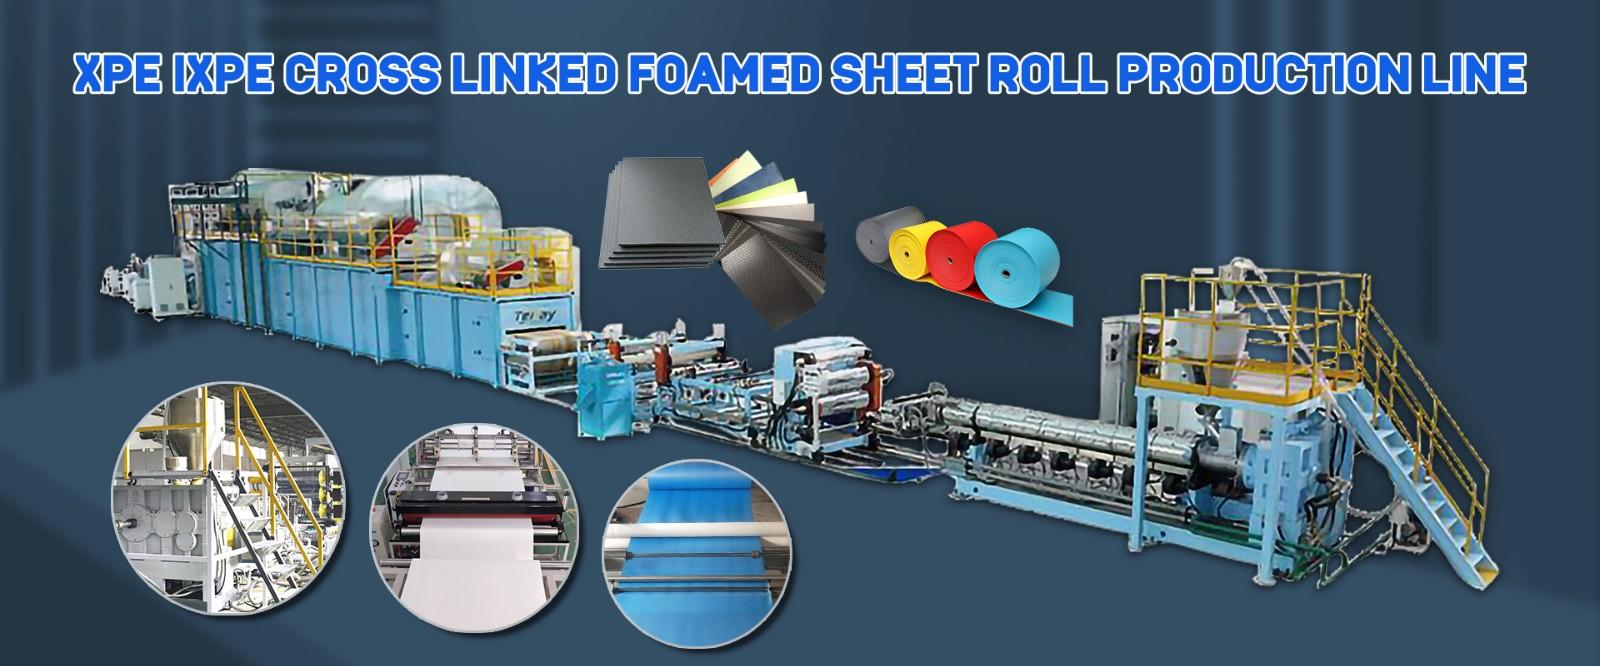 XPE IXPE Cross Linked Foamed Sheet Roll Production Line